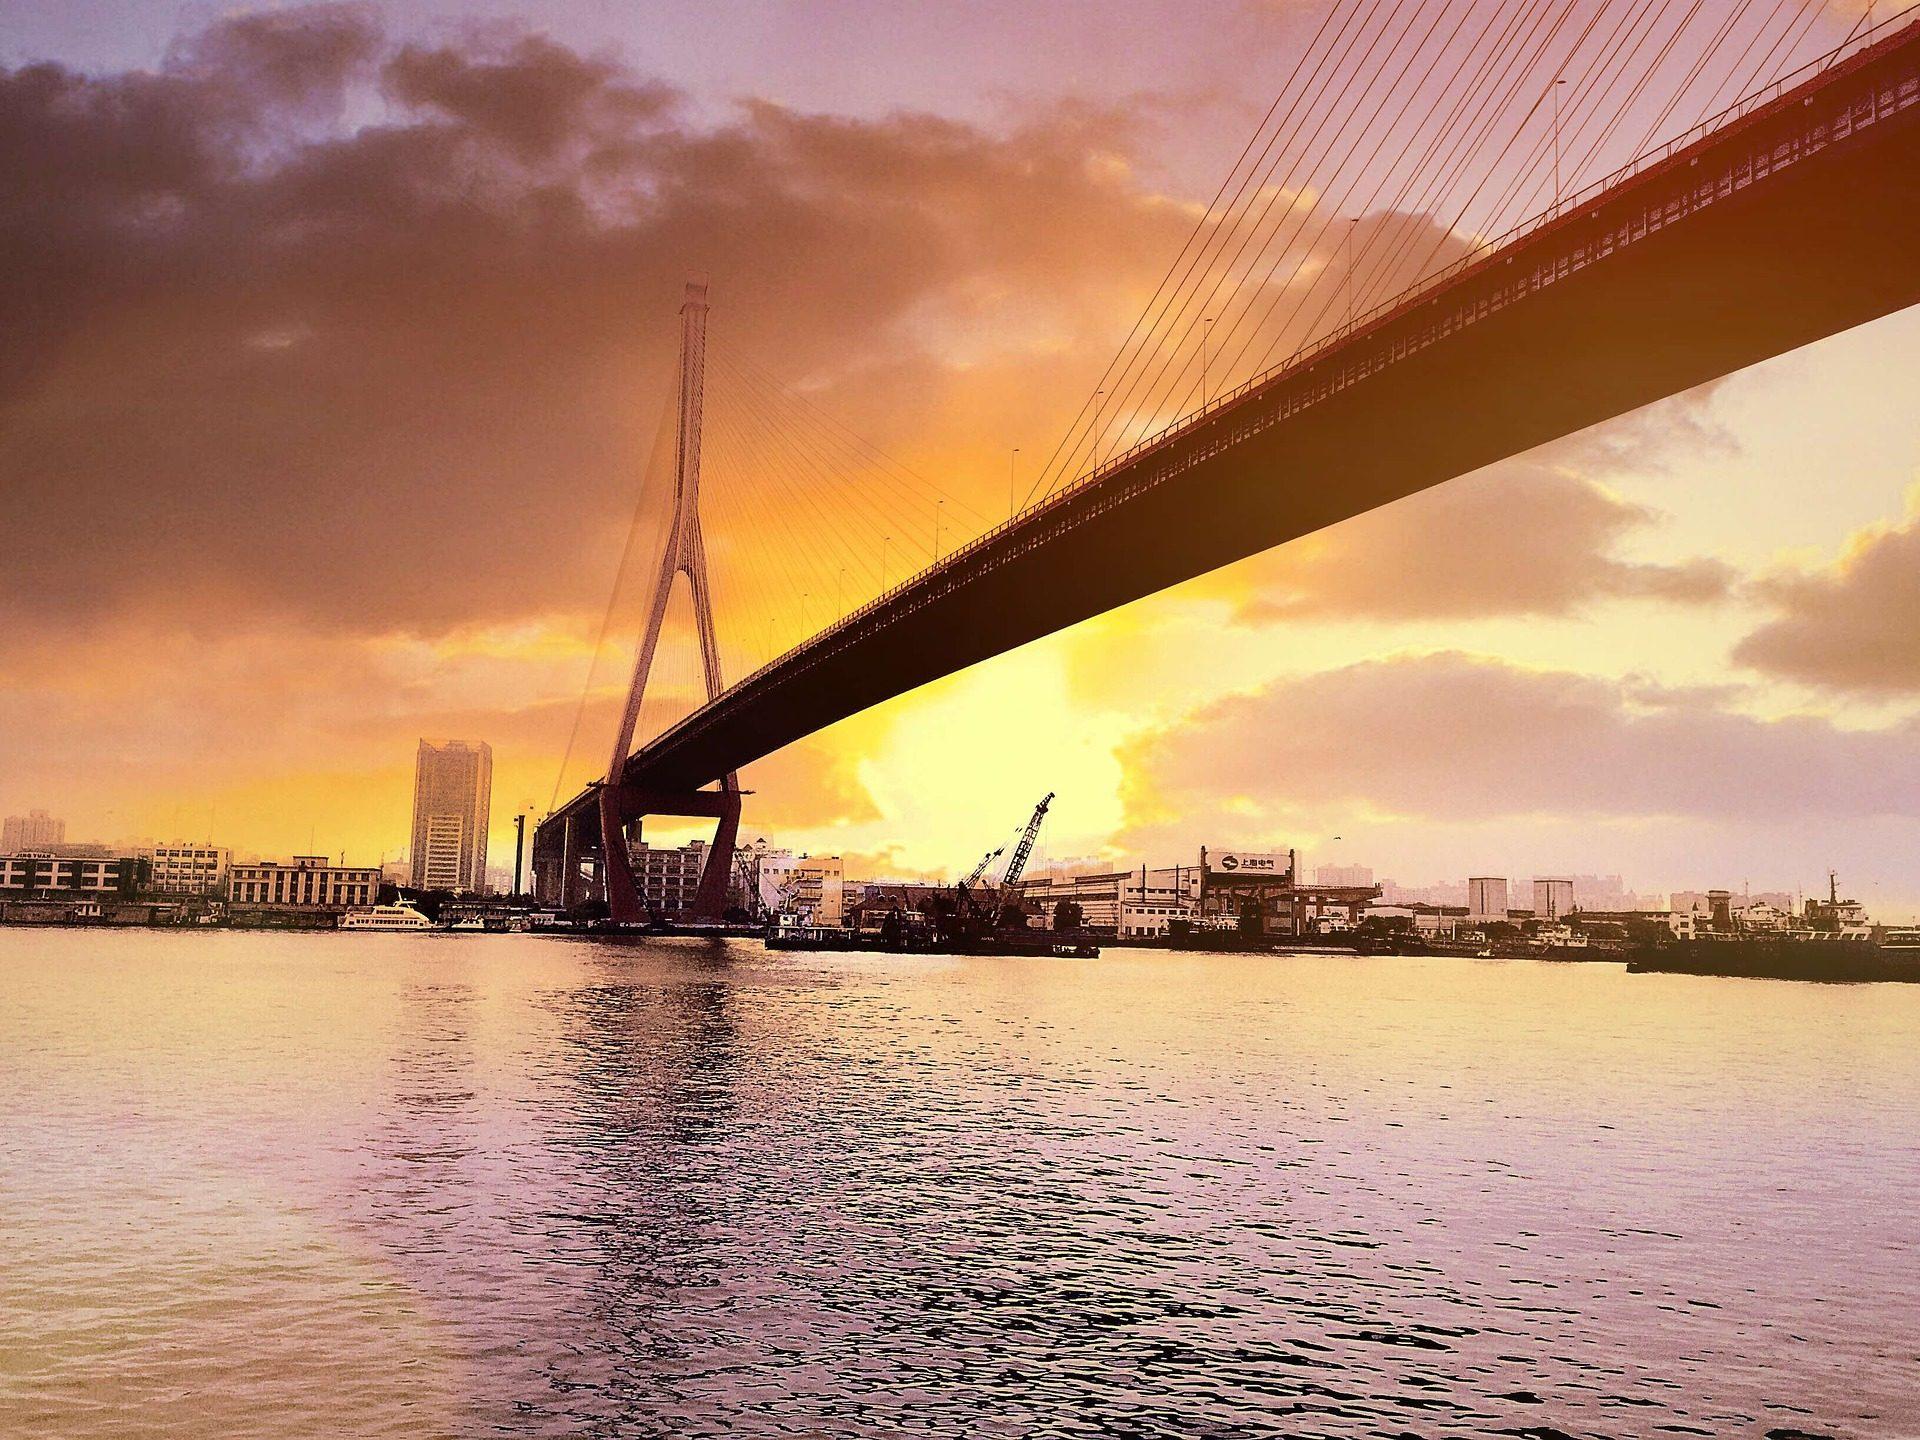 pont, Ville, Coucher de soleil, Mer, Sun - Fonds d'écran HD - Professor-falken.com